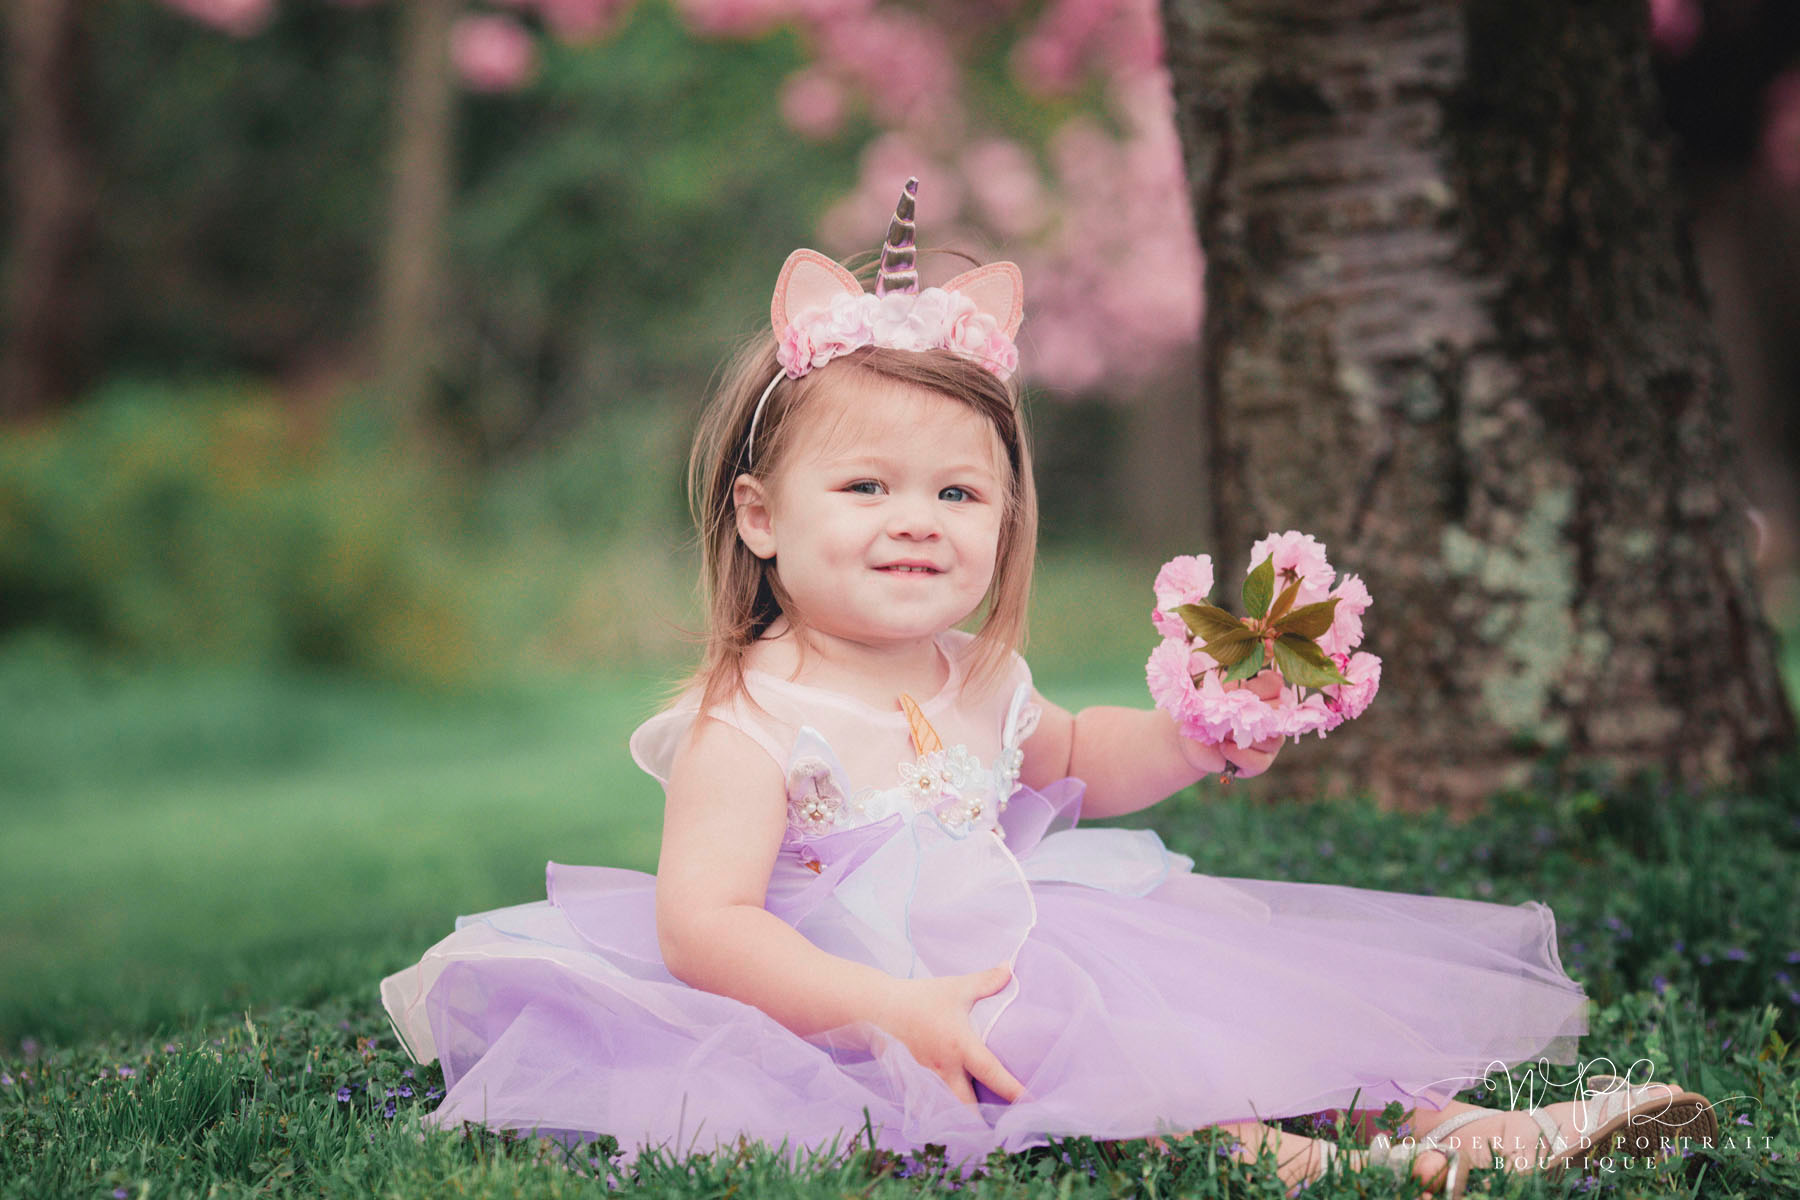 Doylestown-PA-Child-Photography